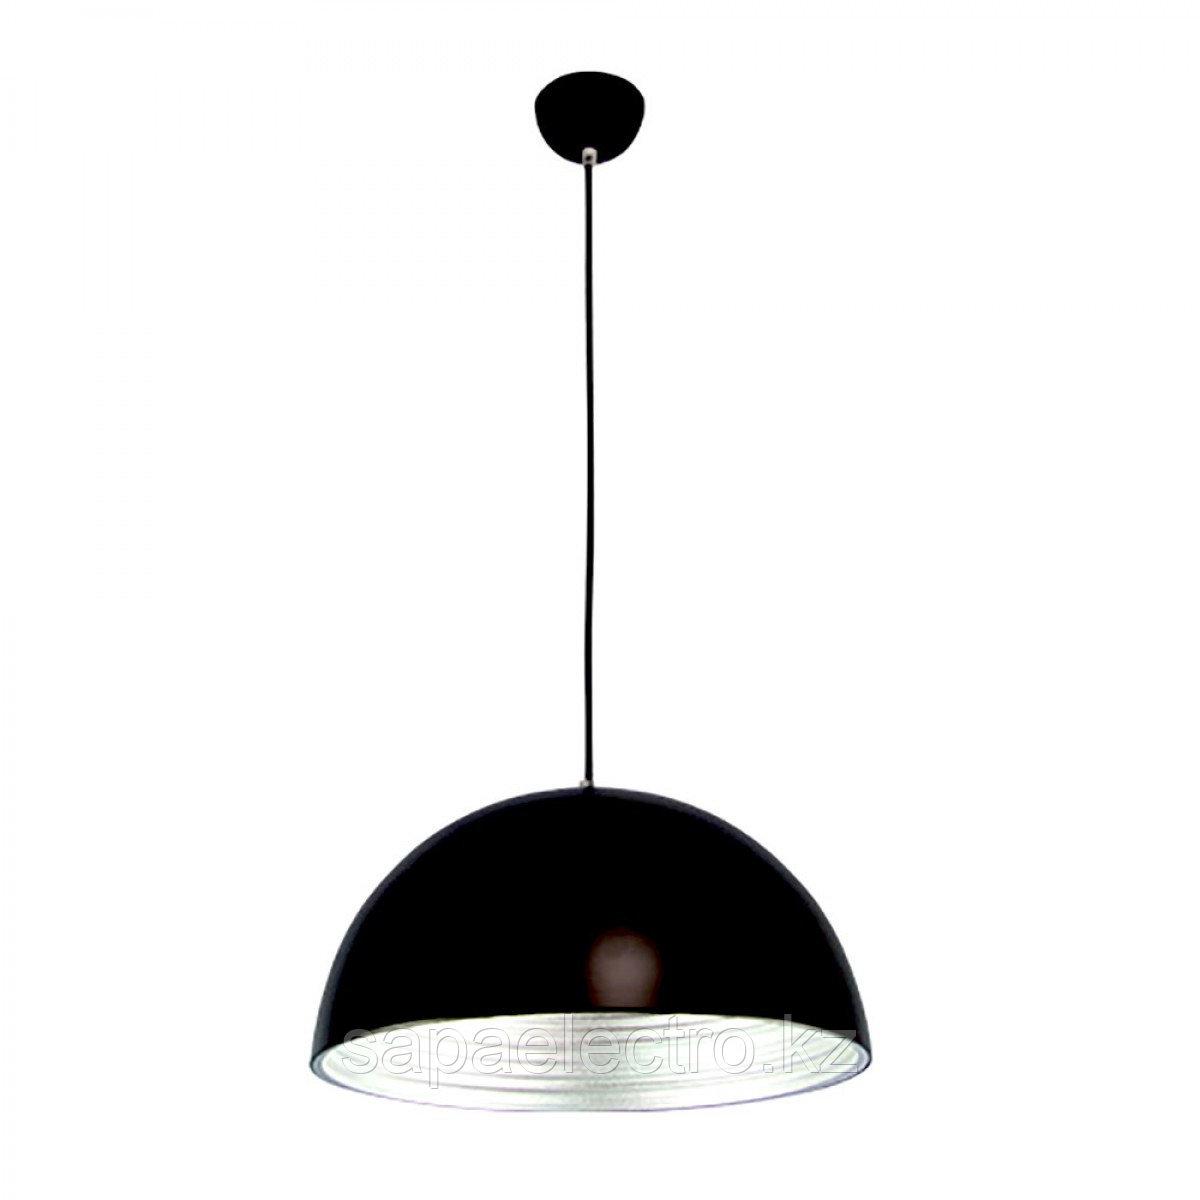 Свет-к SL015 BLACK+SILVER E27 100W  (TEKSAN) 5шт